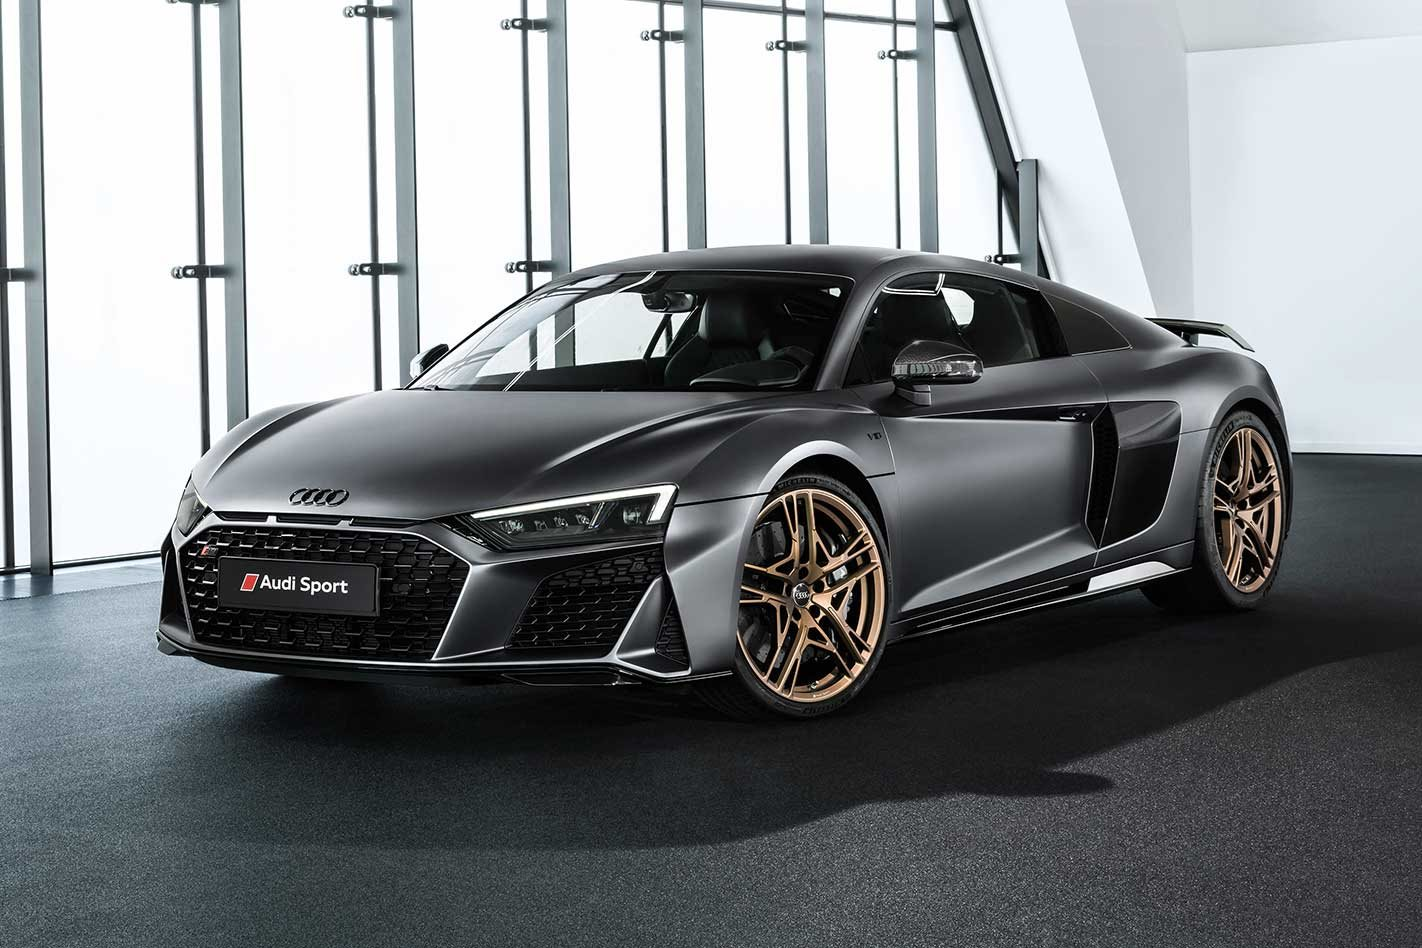 Kelebihan Audi R8 V10 2019 Tangguh